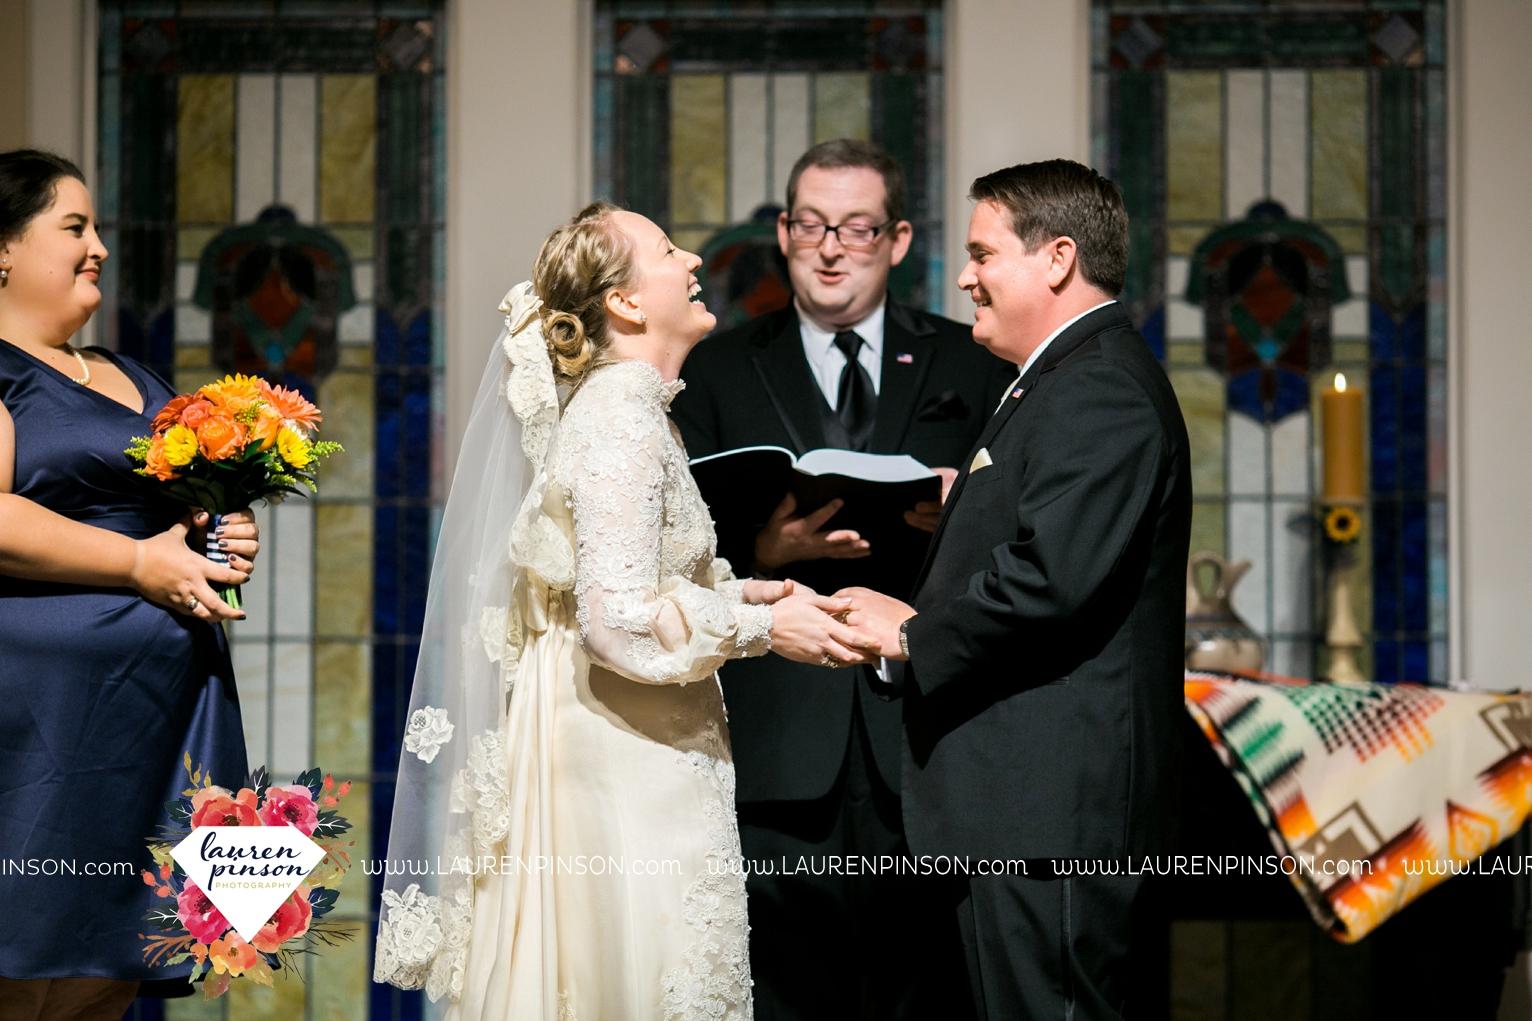 bells-texas-wedding-photography-at-willowood-ranch-chapel-north-texas-wichita-falls-wedding-photographer_1872.jpg